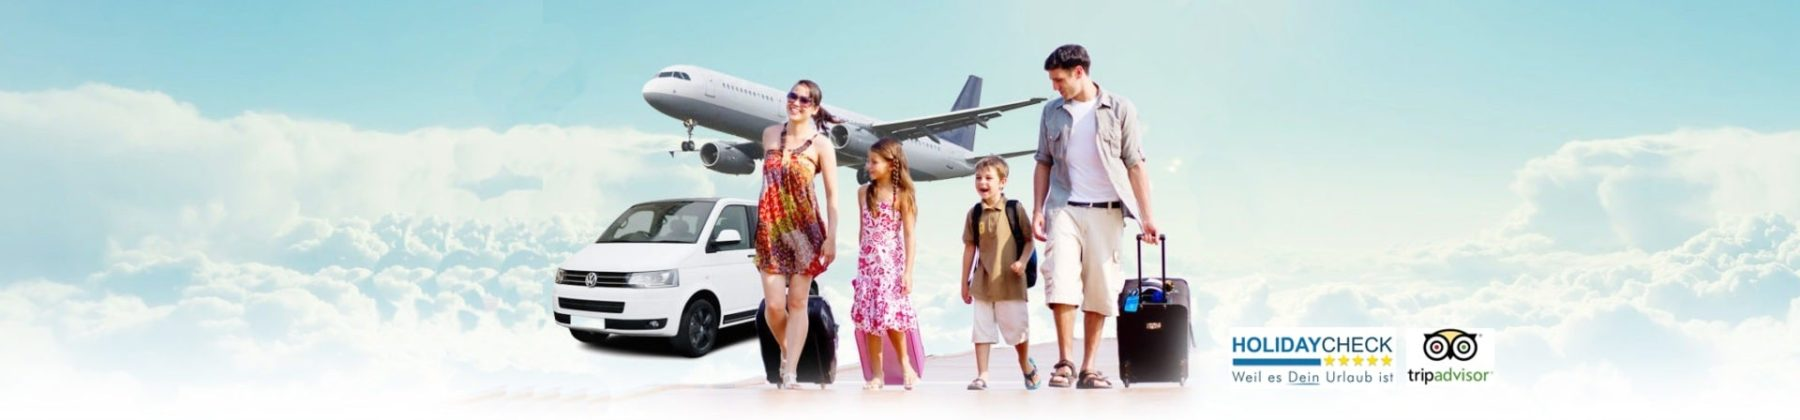 Mallorca Flughafen Transfer zum Hotel